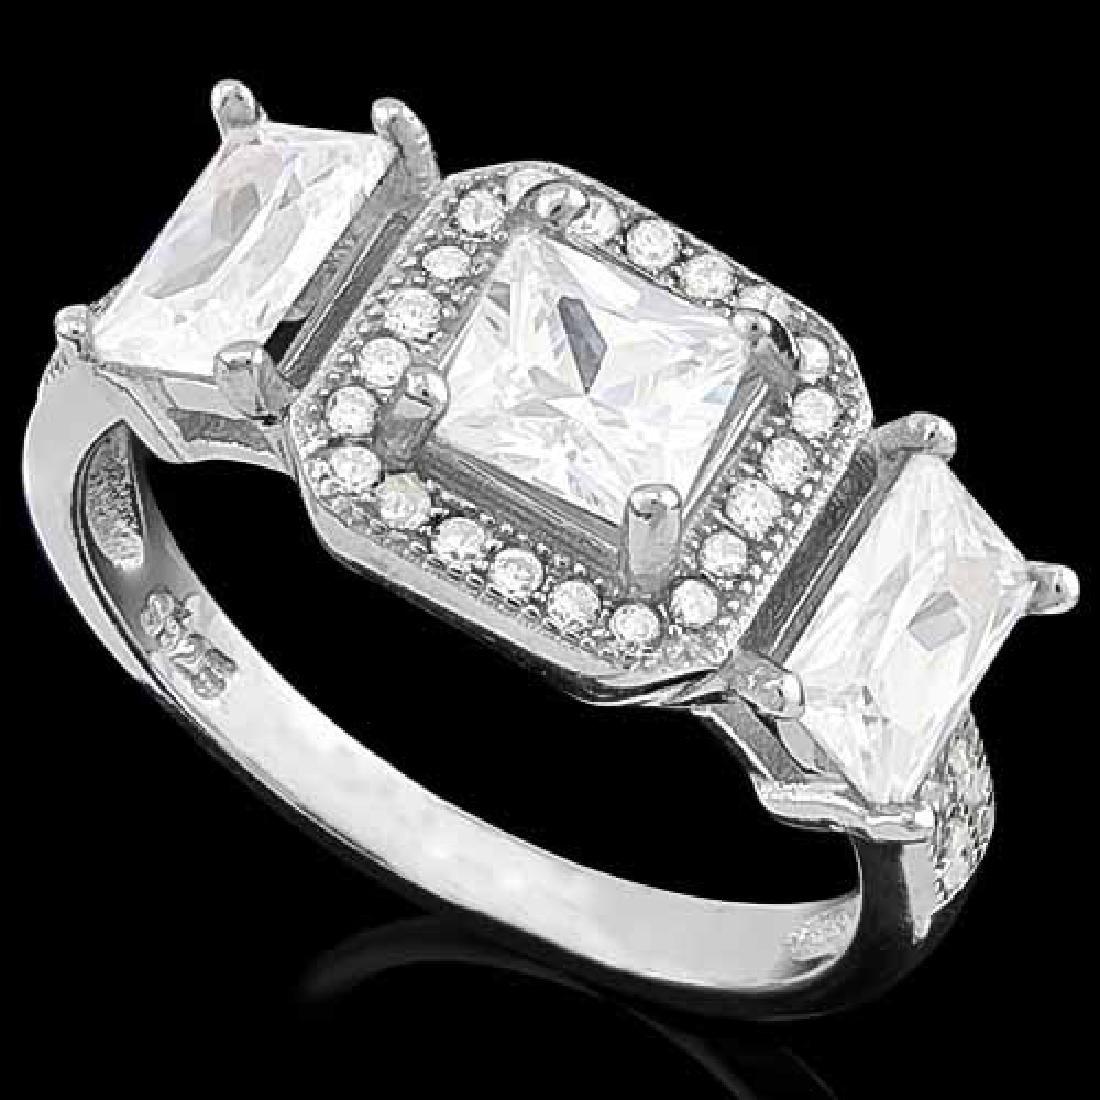 6 4/5 CARAT (43 PCS) FLAWLESS CREATED DIAMOND 925 STERL